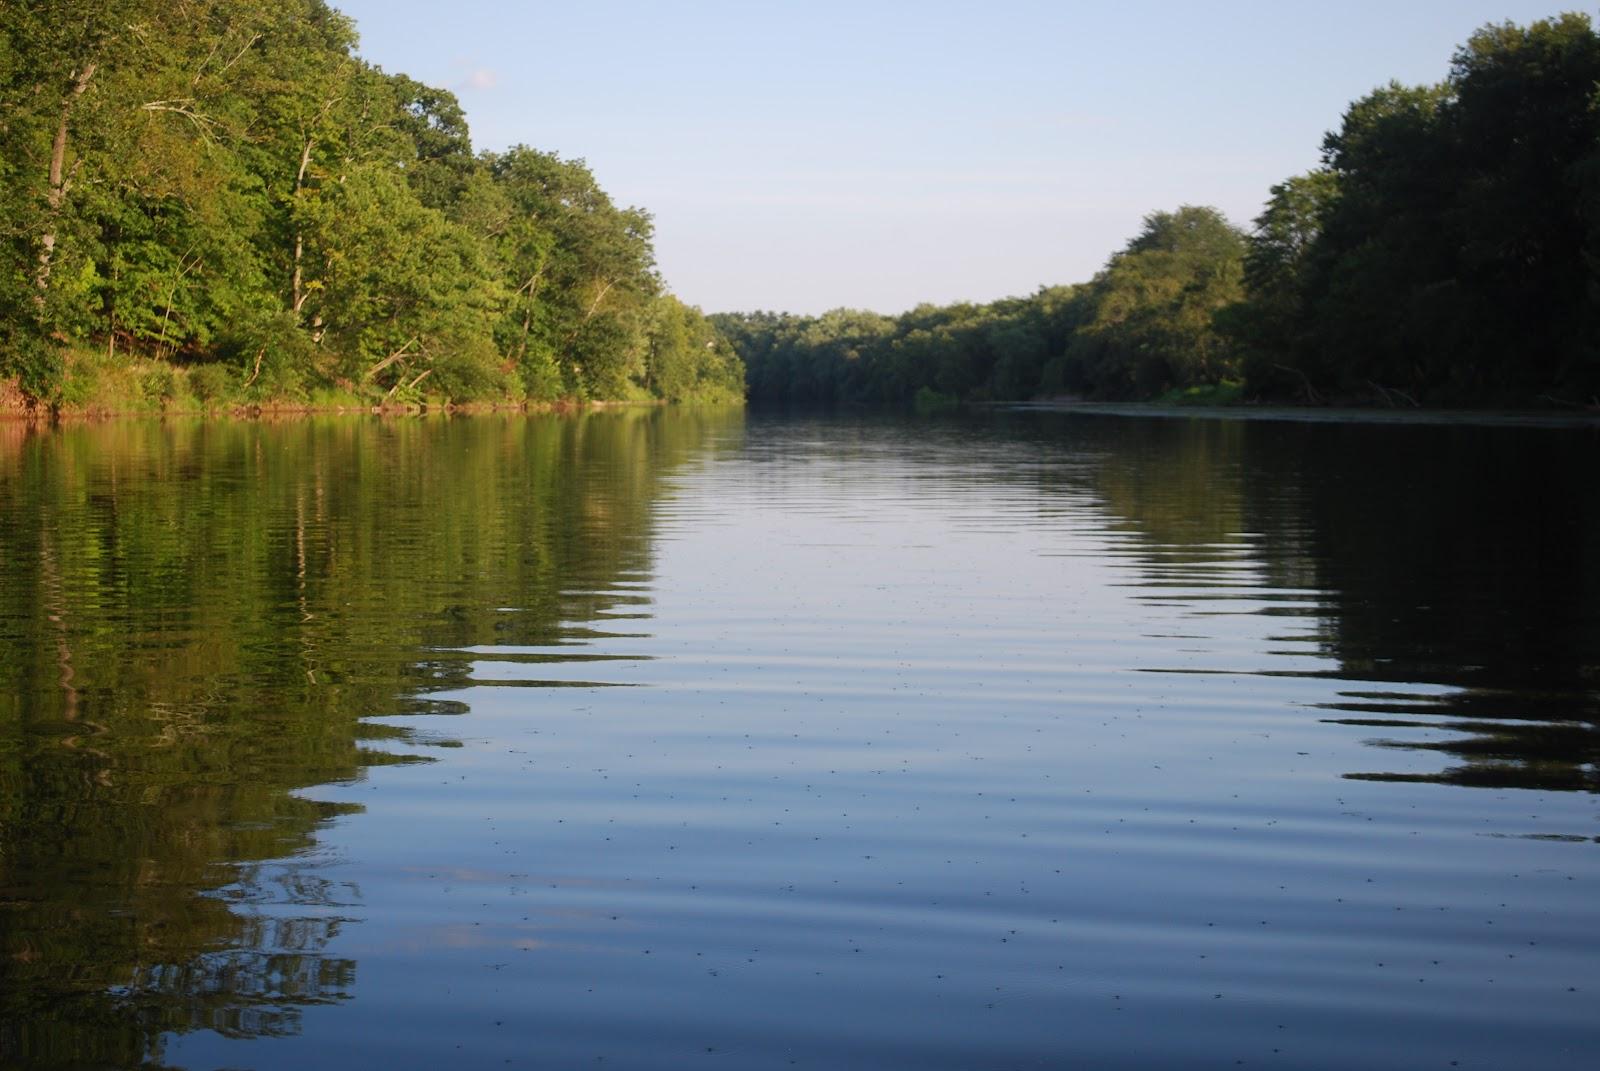 Litton 39 s fishing lines raritan river confluence for Raritan river fishing